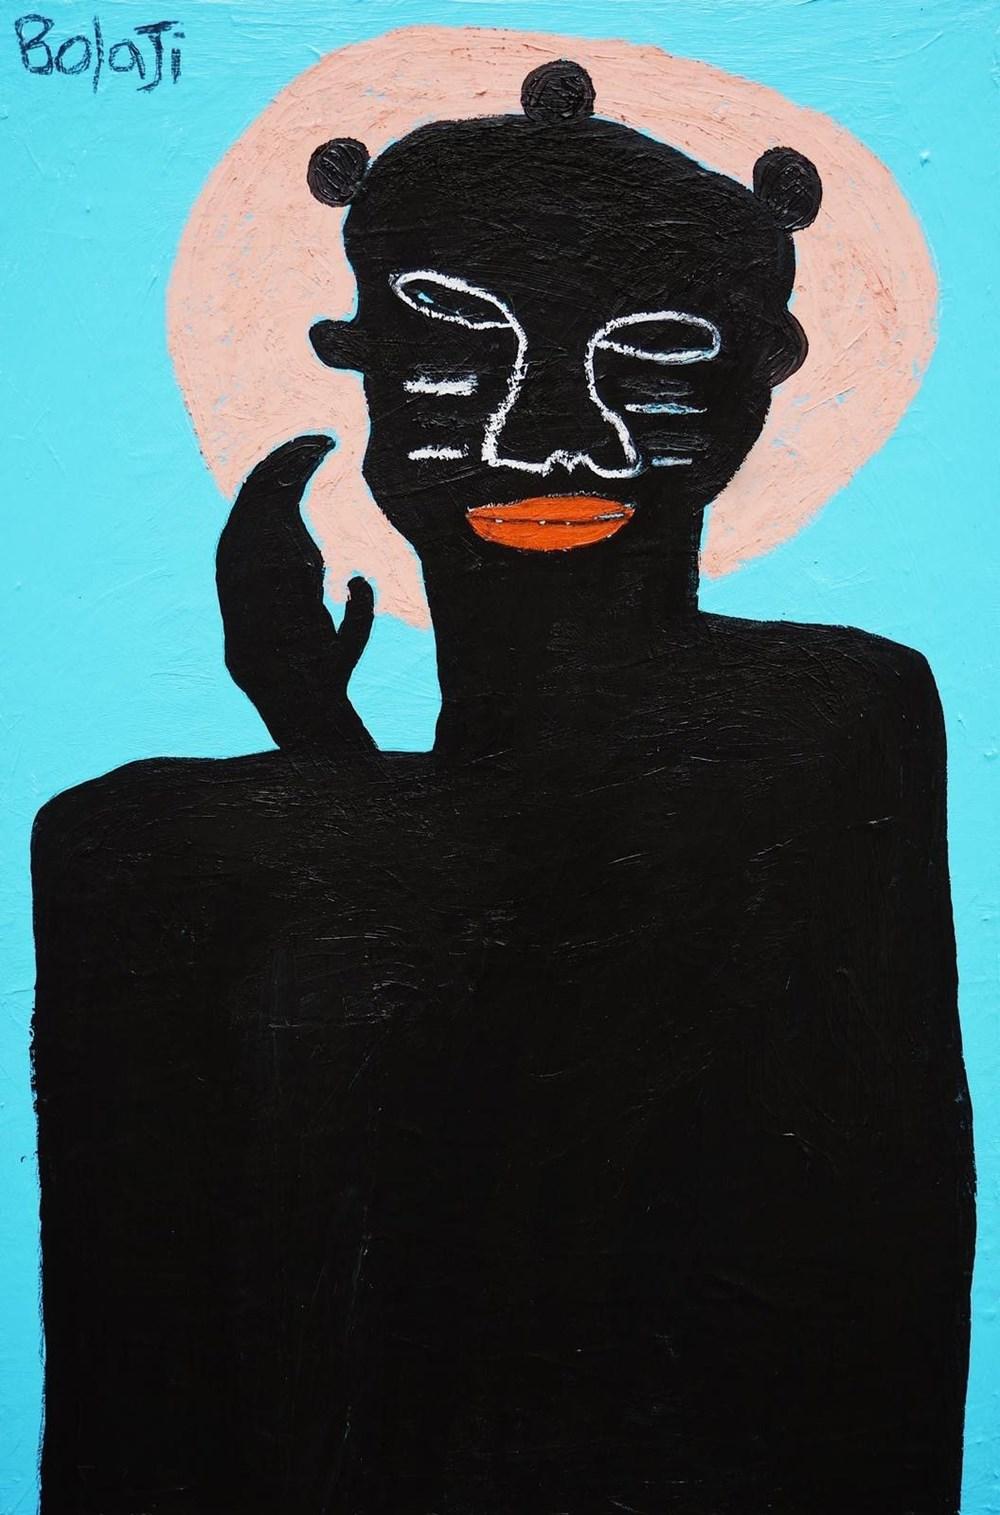 Future Dreams - Lot 3, Adebayo Bolaji, Her name is